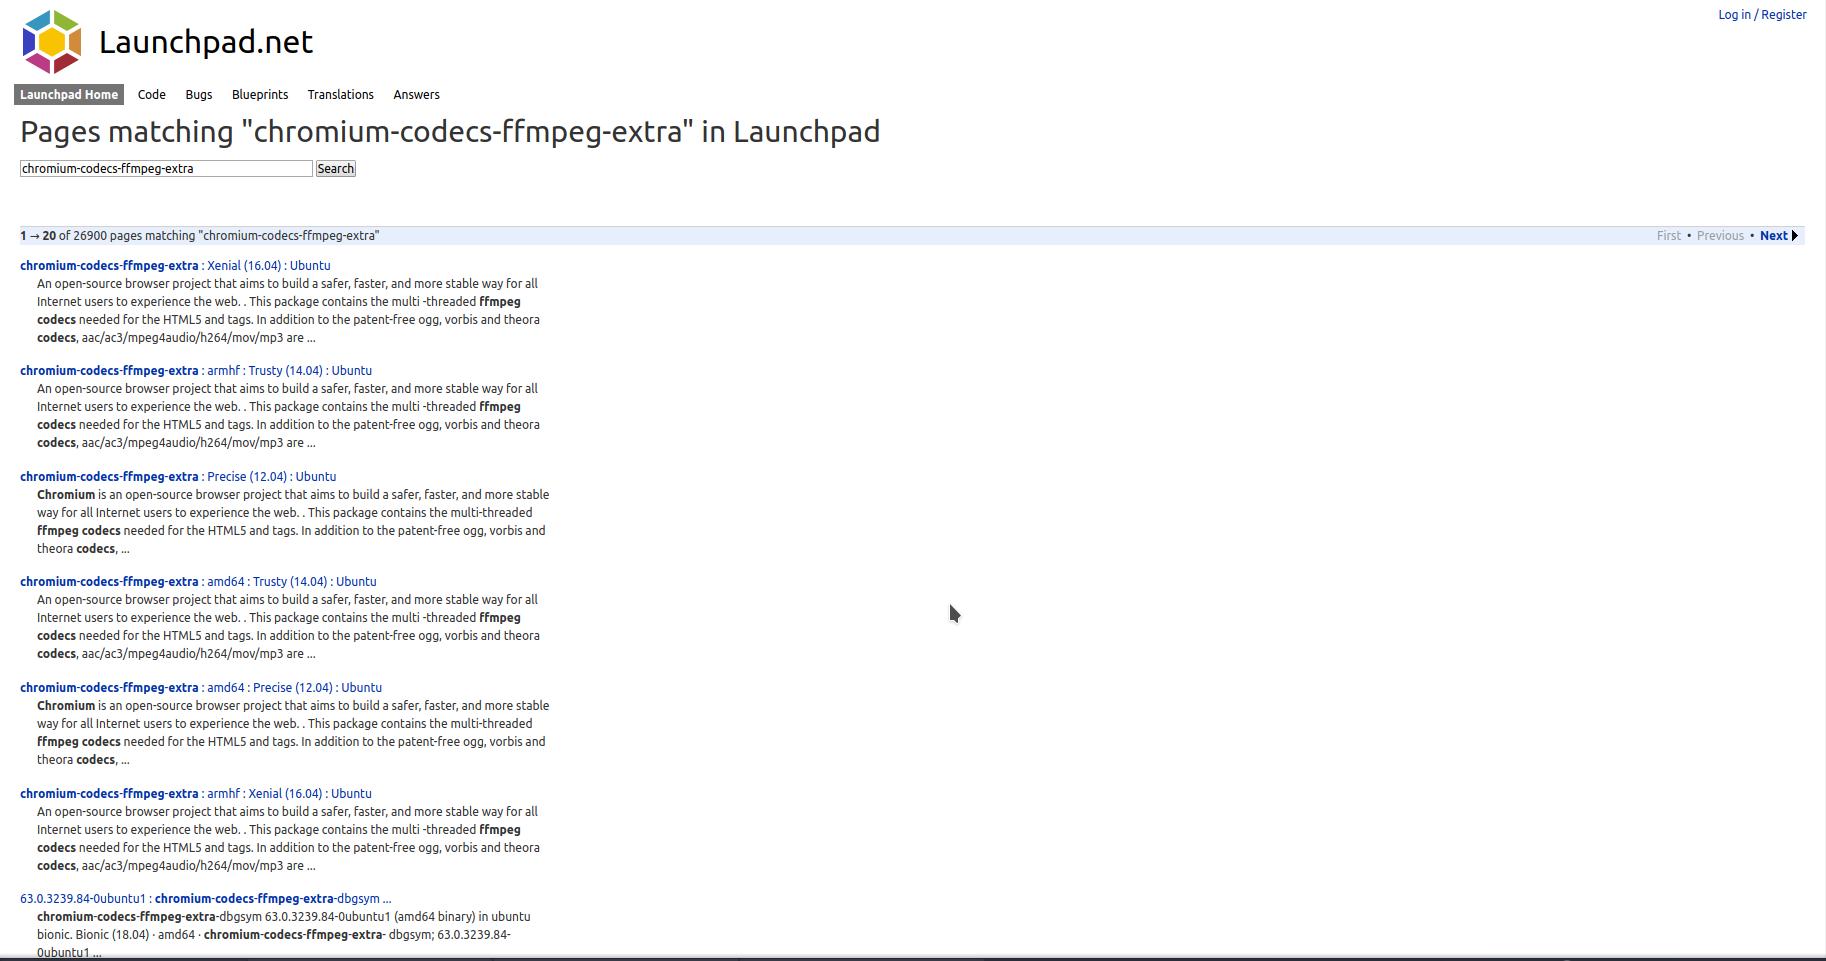 install flash player for firefox ubuntu 16.04